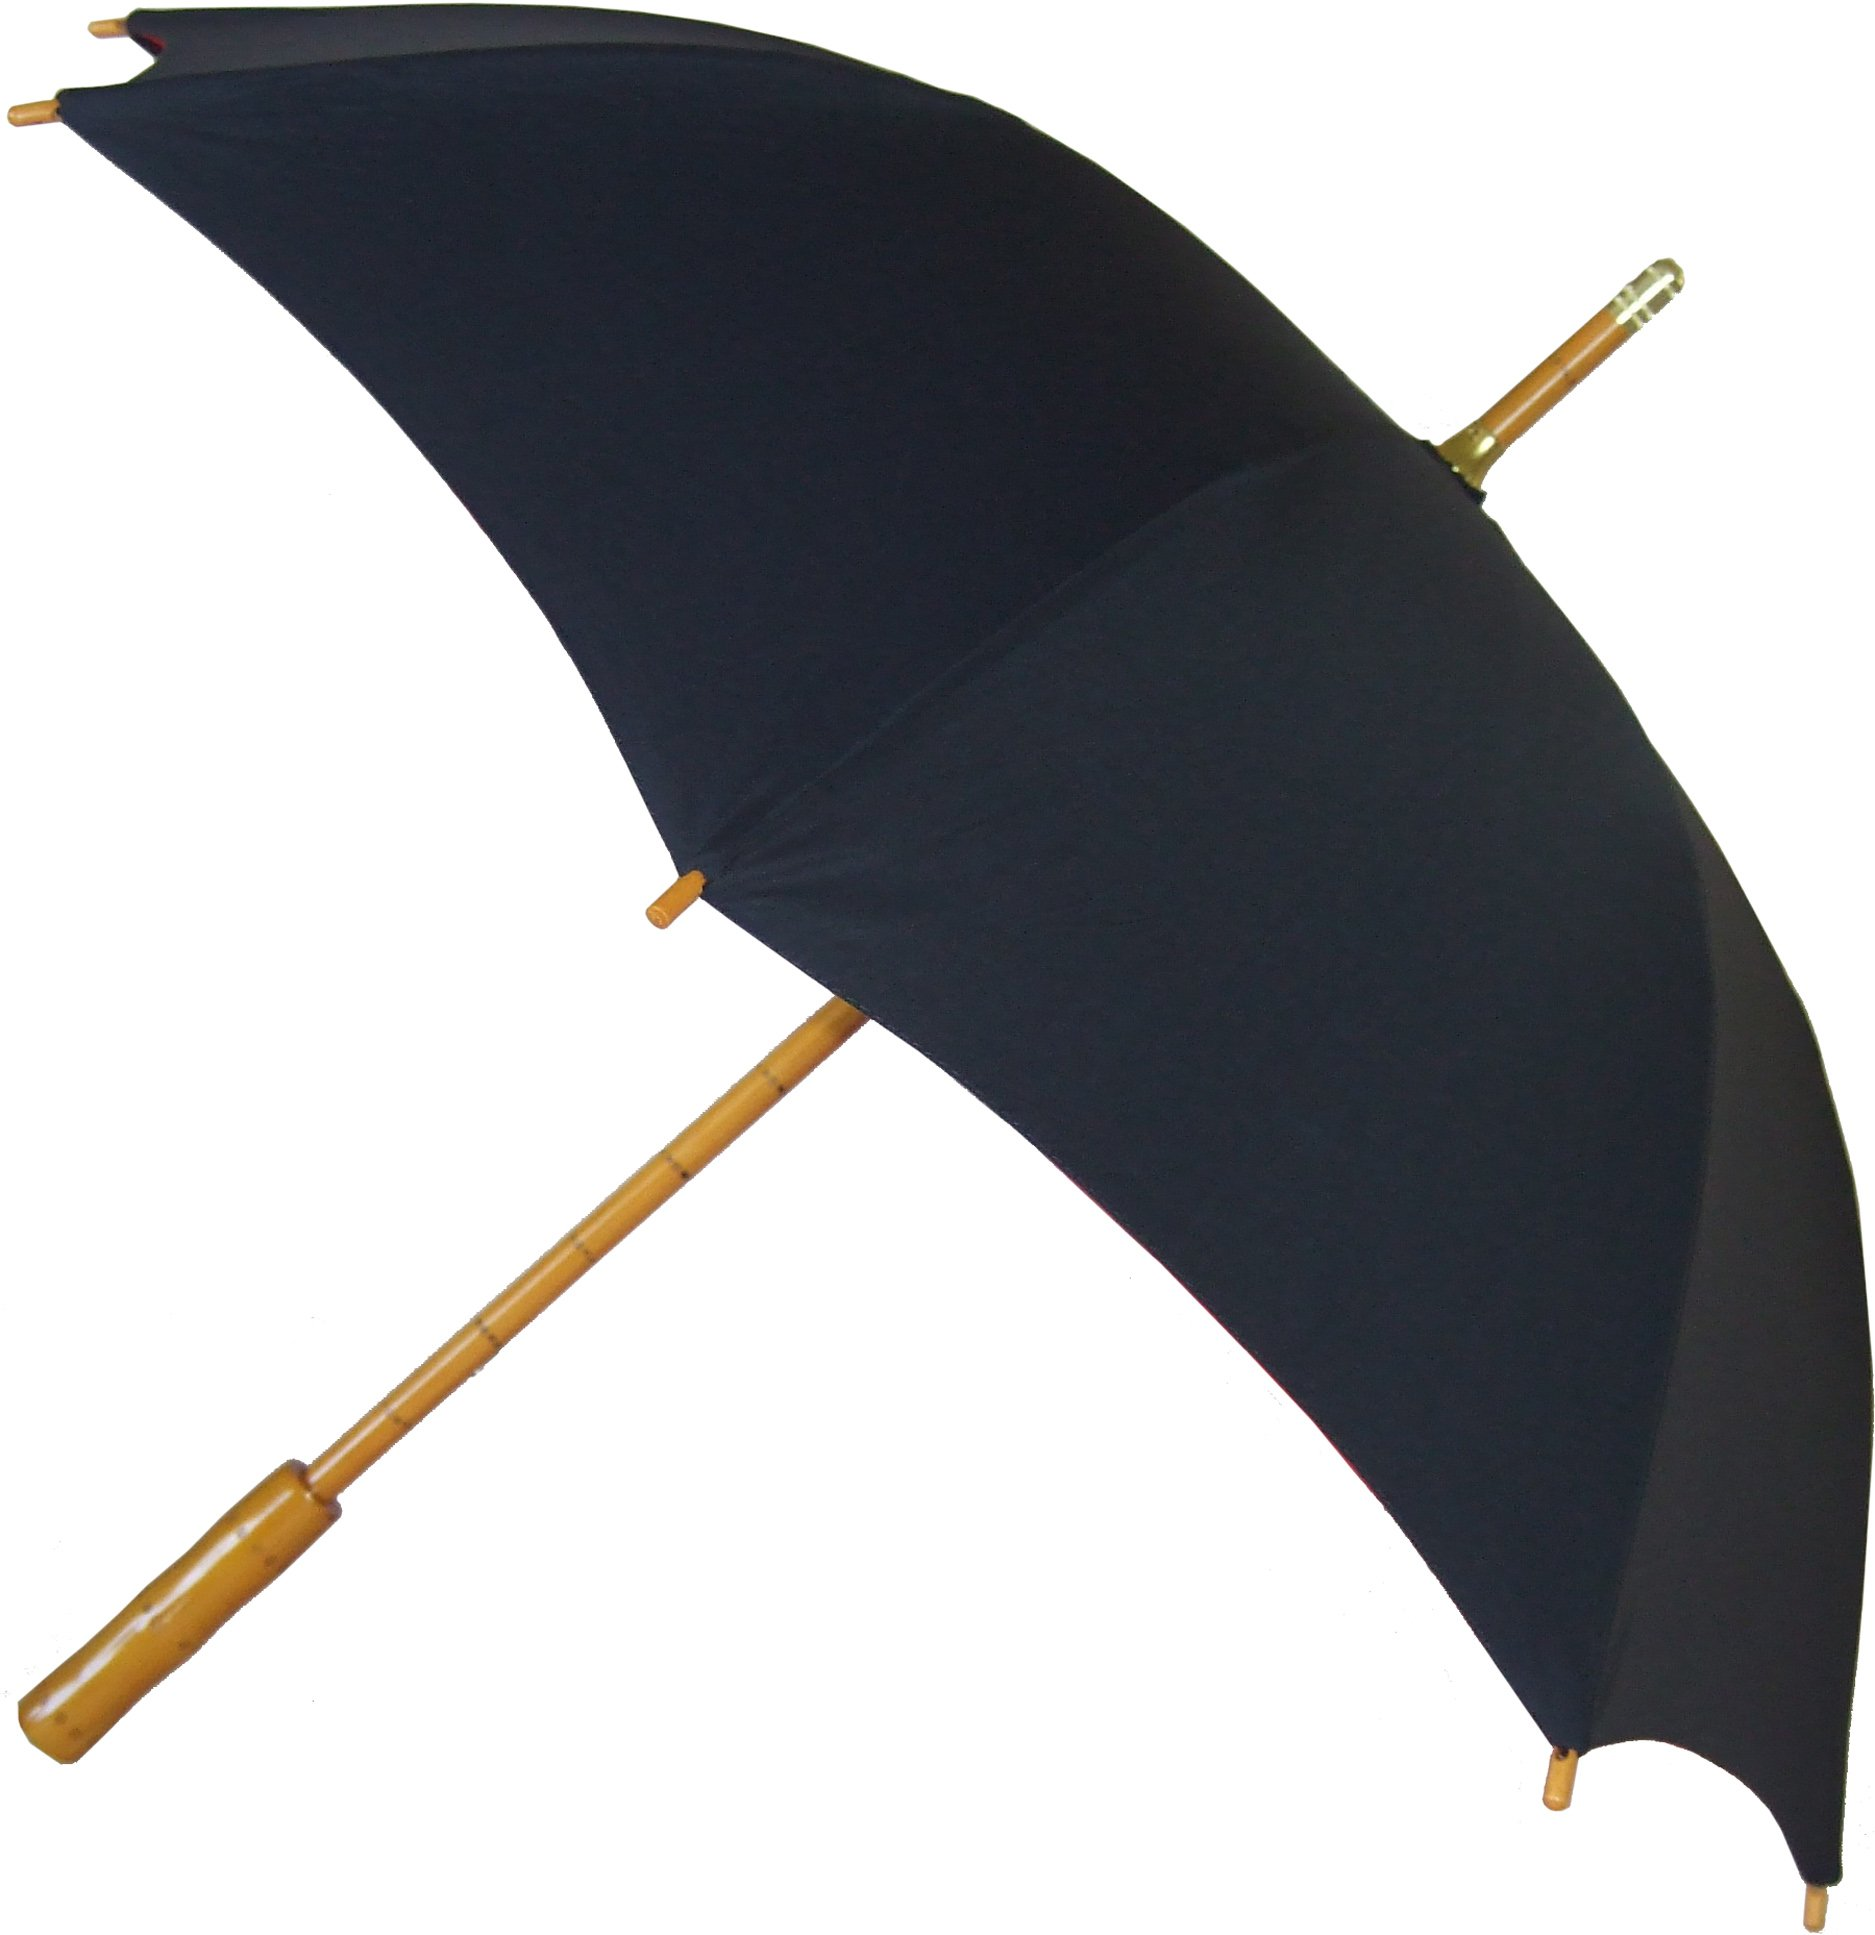 Umbrellas Hawaii - Sun Protection UPF 50+ (Tan Tropical) by Umbrellas Hawaii (Image #2)